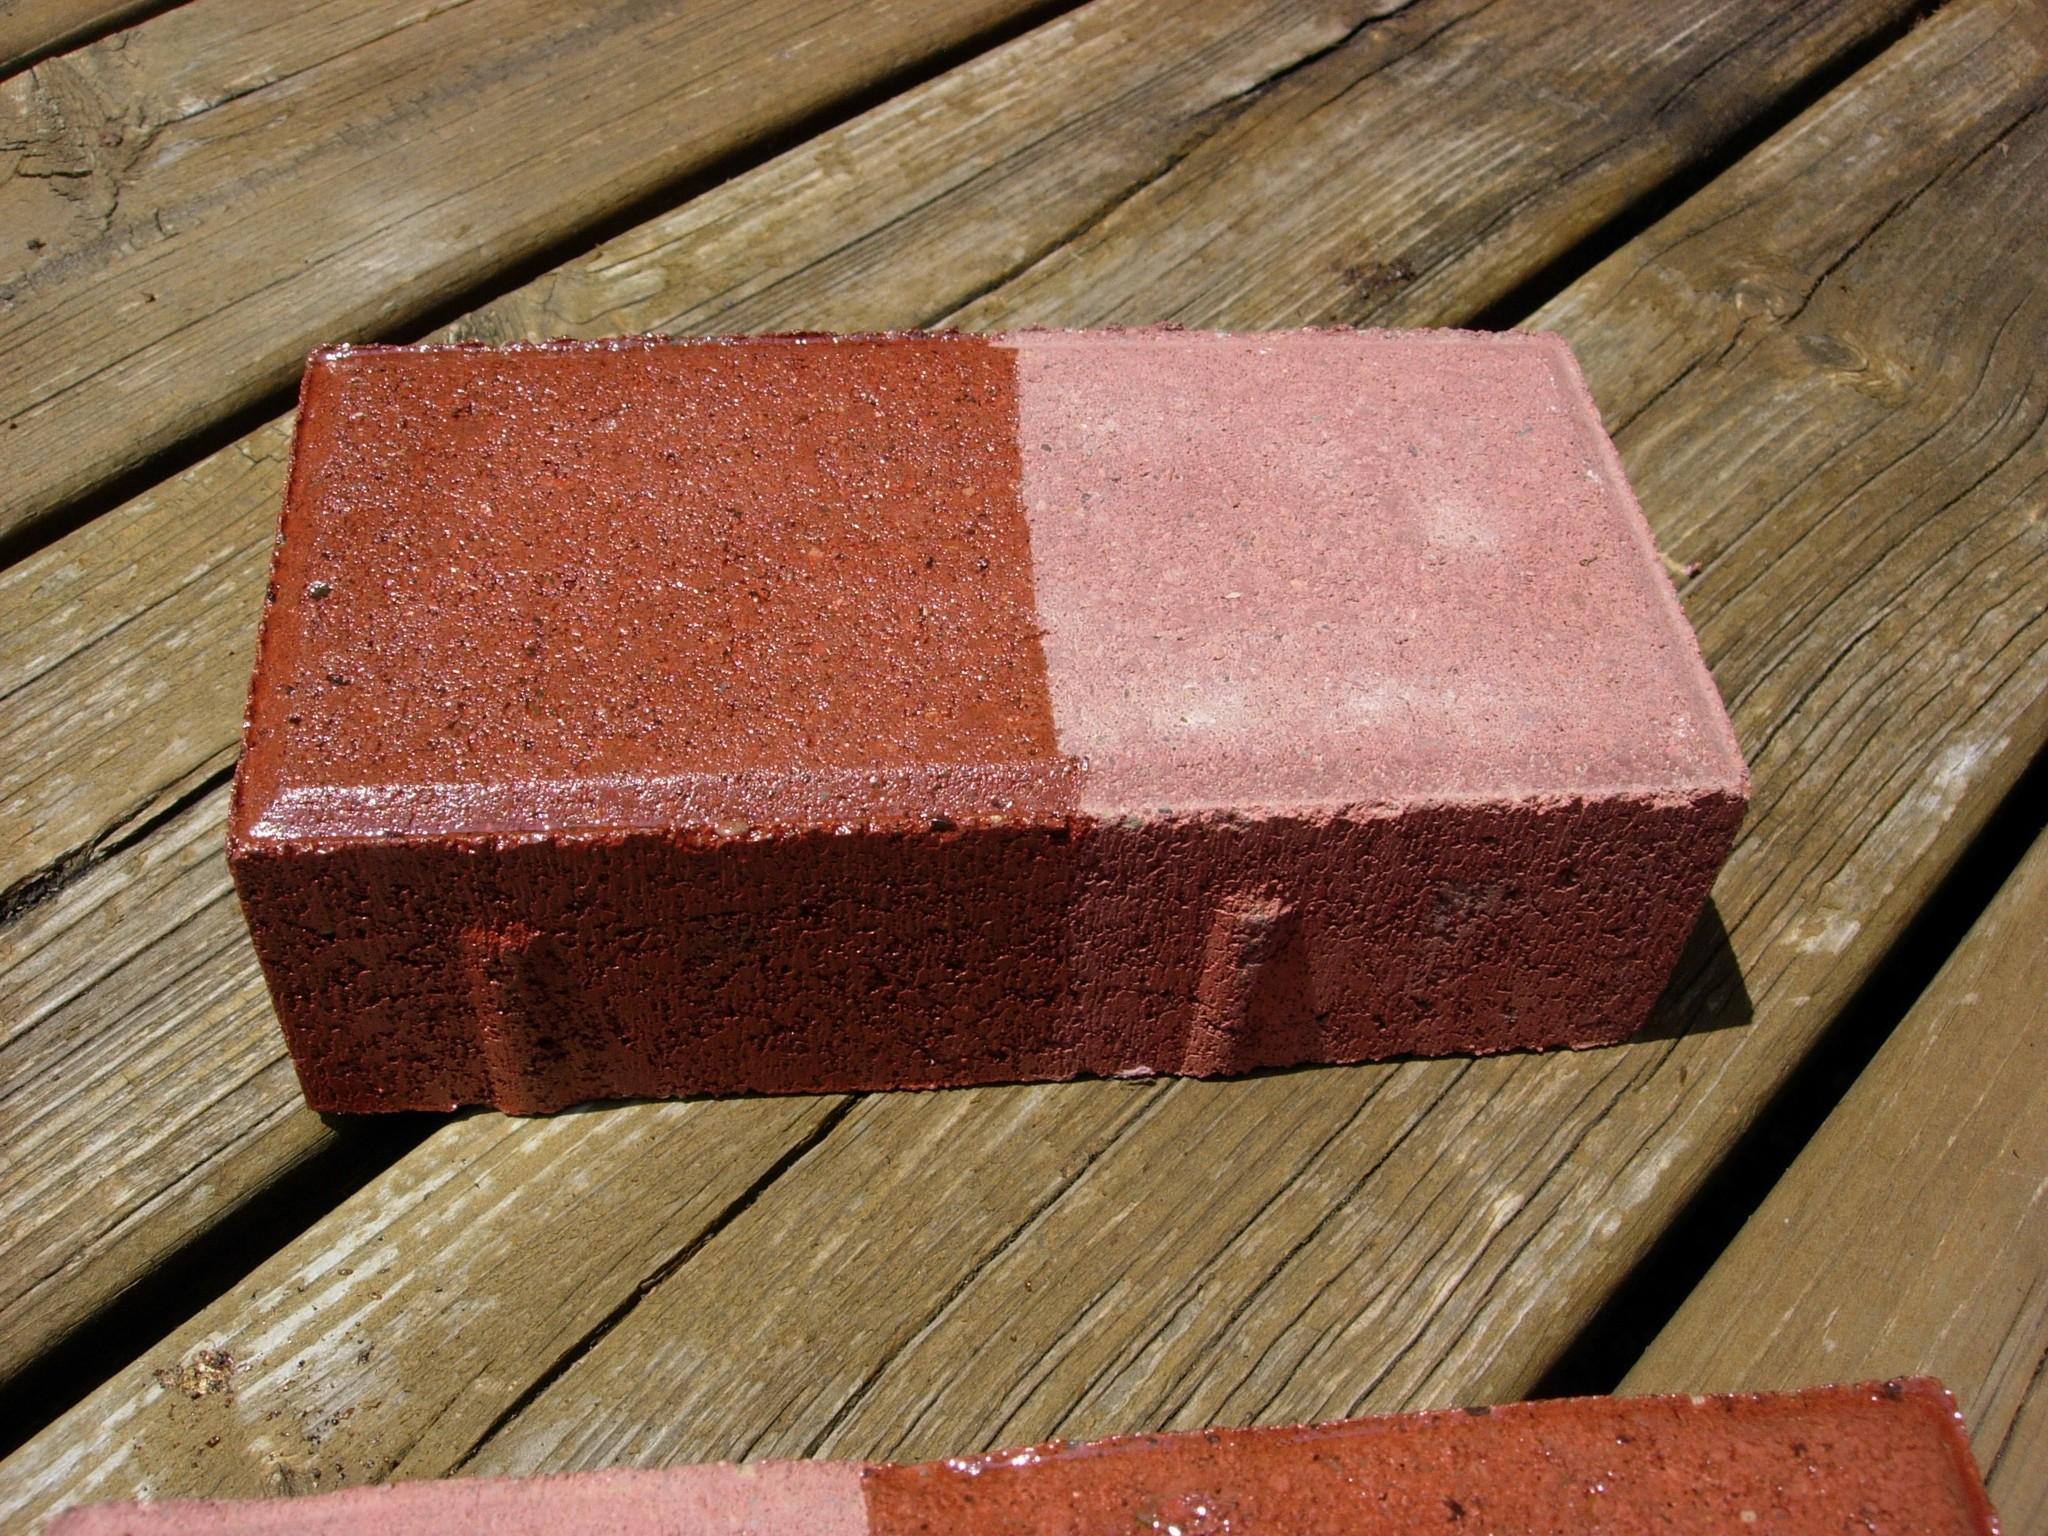 http://www.vseal.com/media/catalog/product/cache/1/image/9df78eab33525d08d6e5fb8d27136e95/P/i/Pic_Concrete_Paver_Red_Brick_Half_Sealed_IG-SB_3.jpg